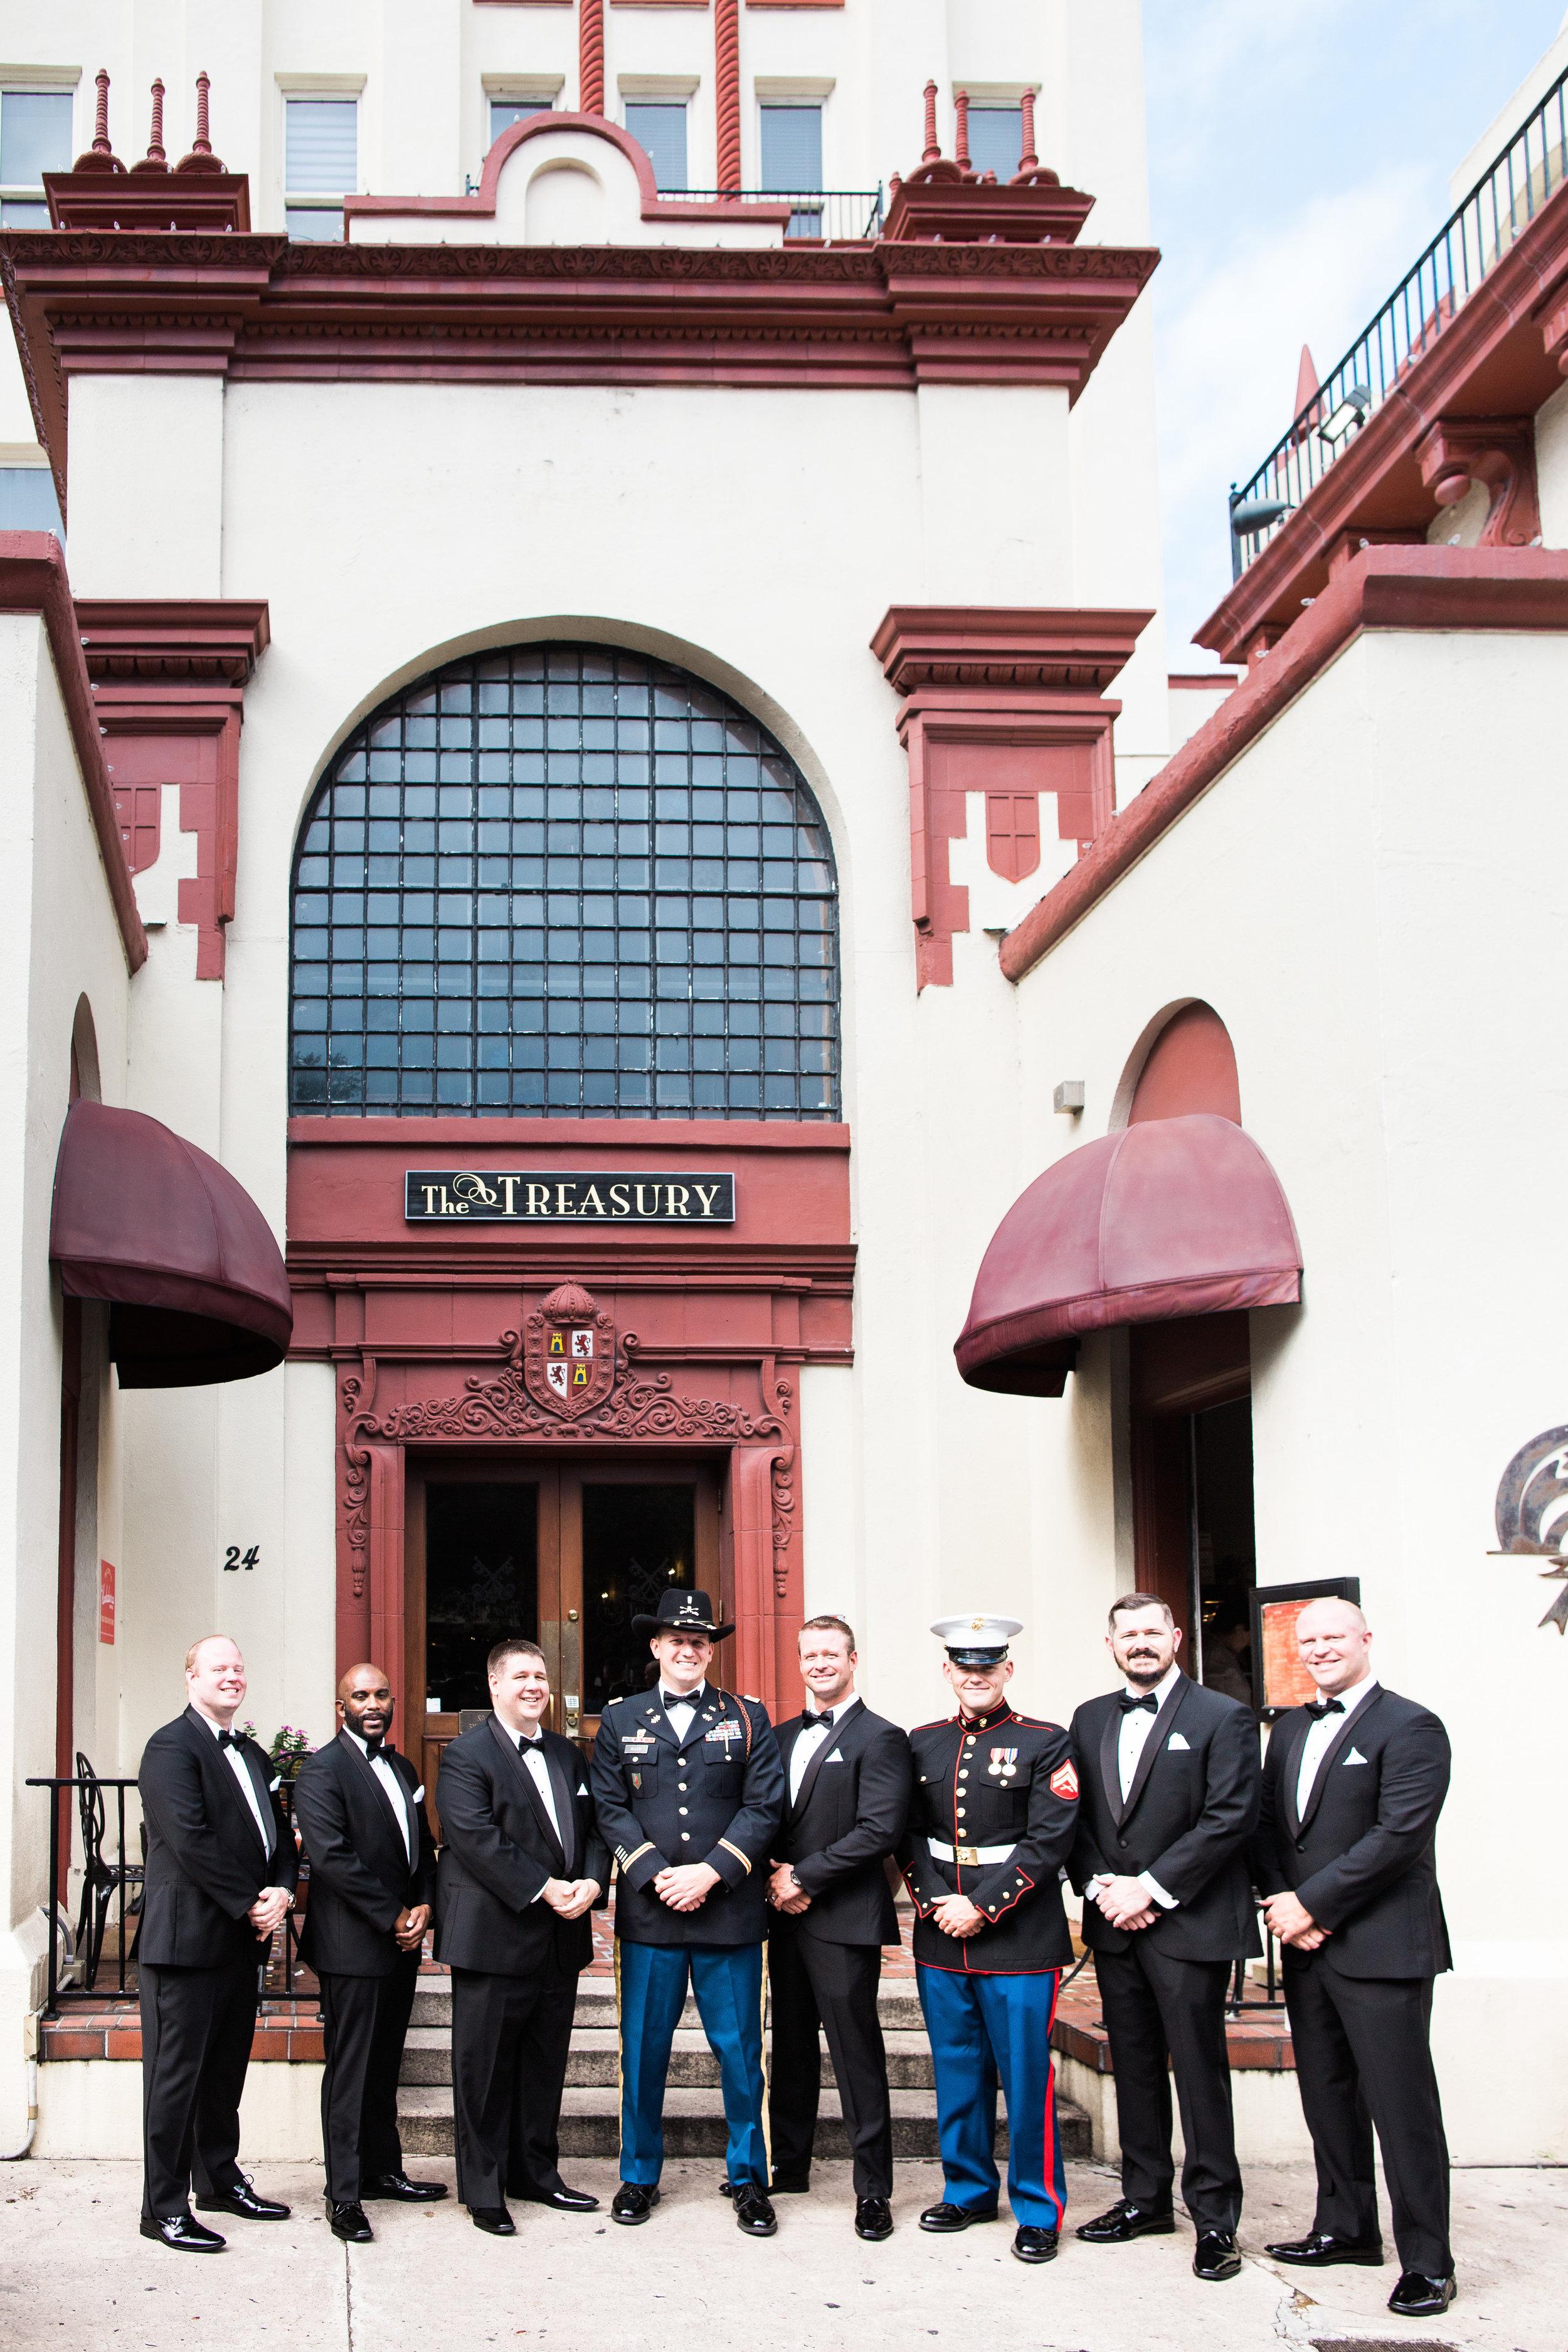 Taylor_TJ_St_Augustine_Treasury_on_the_Plaza_Wedding_Photography__0017_-17.jpg